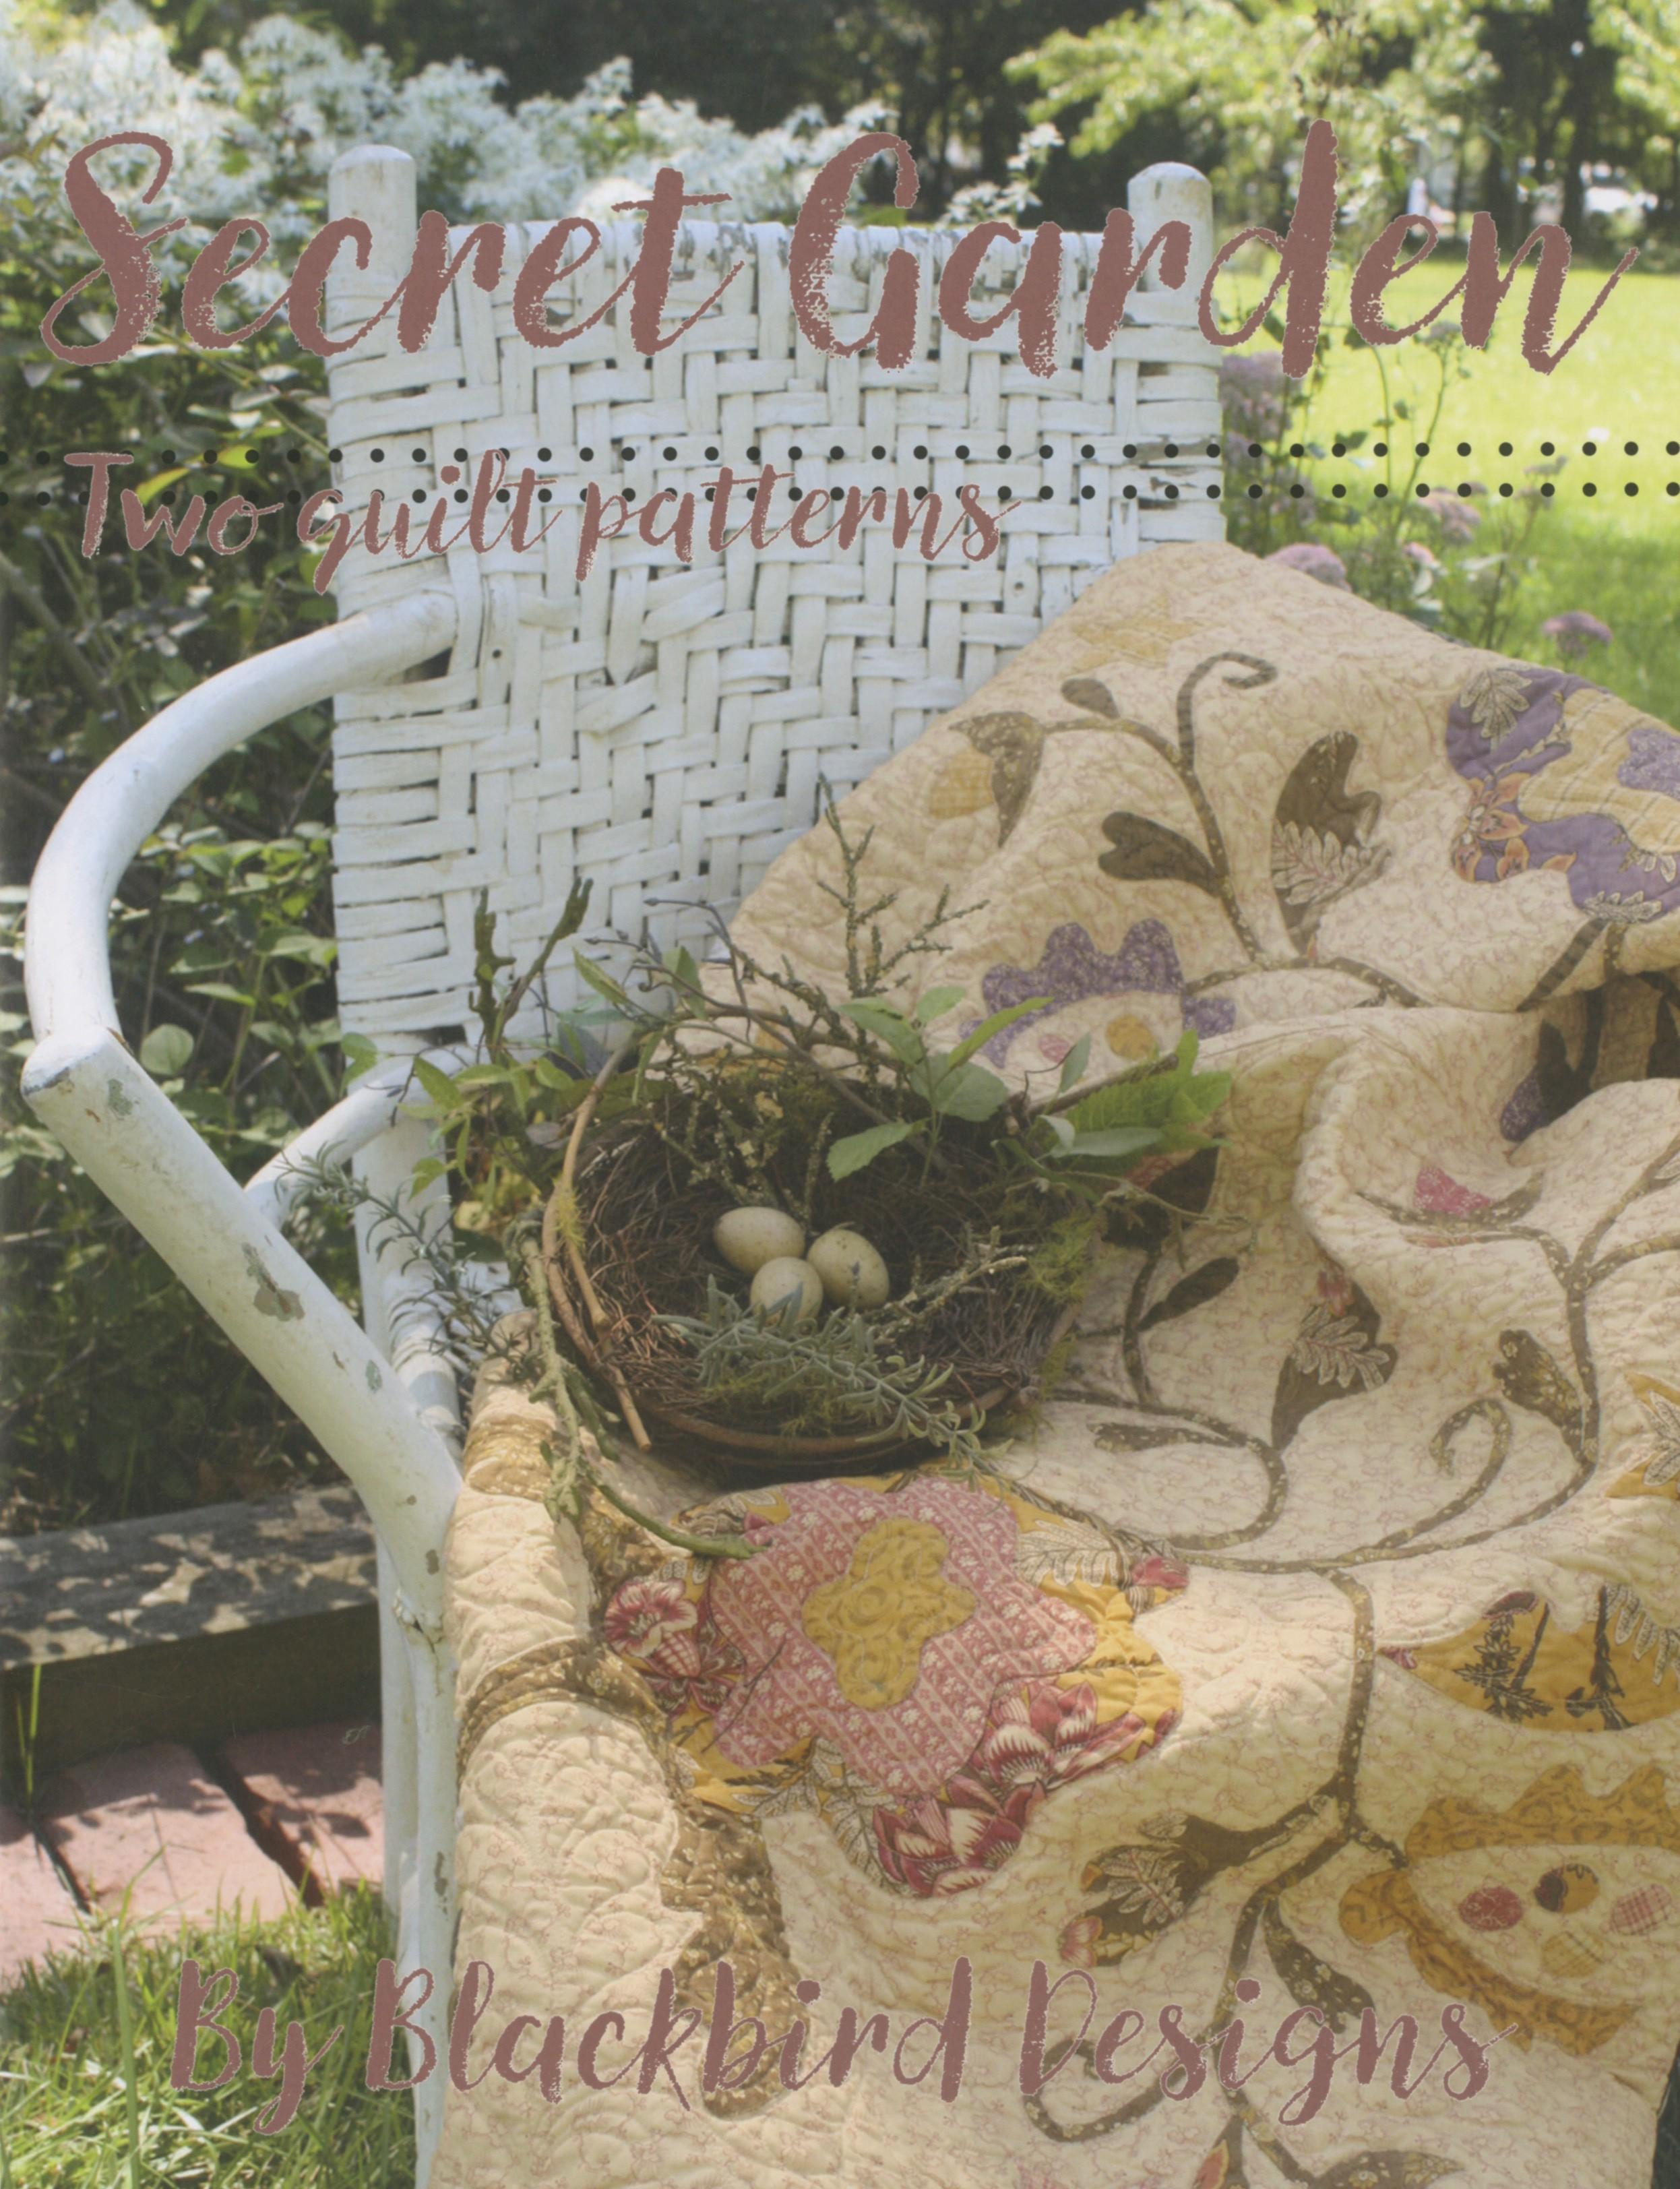 Secret garden two quilt patterns book by blackbird for Garden club book by blackbird designs